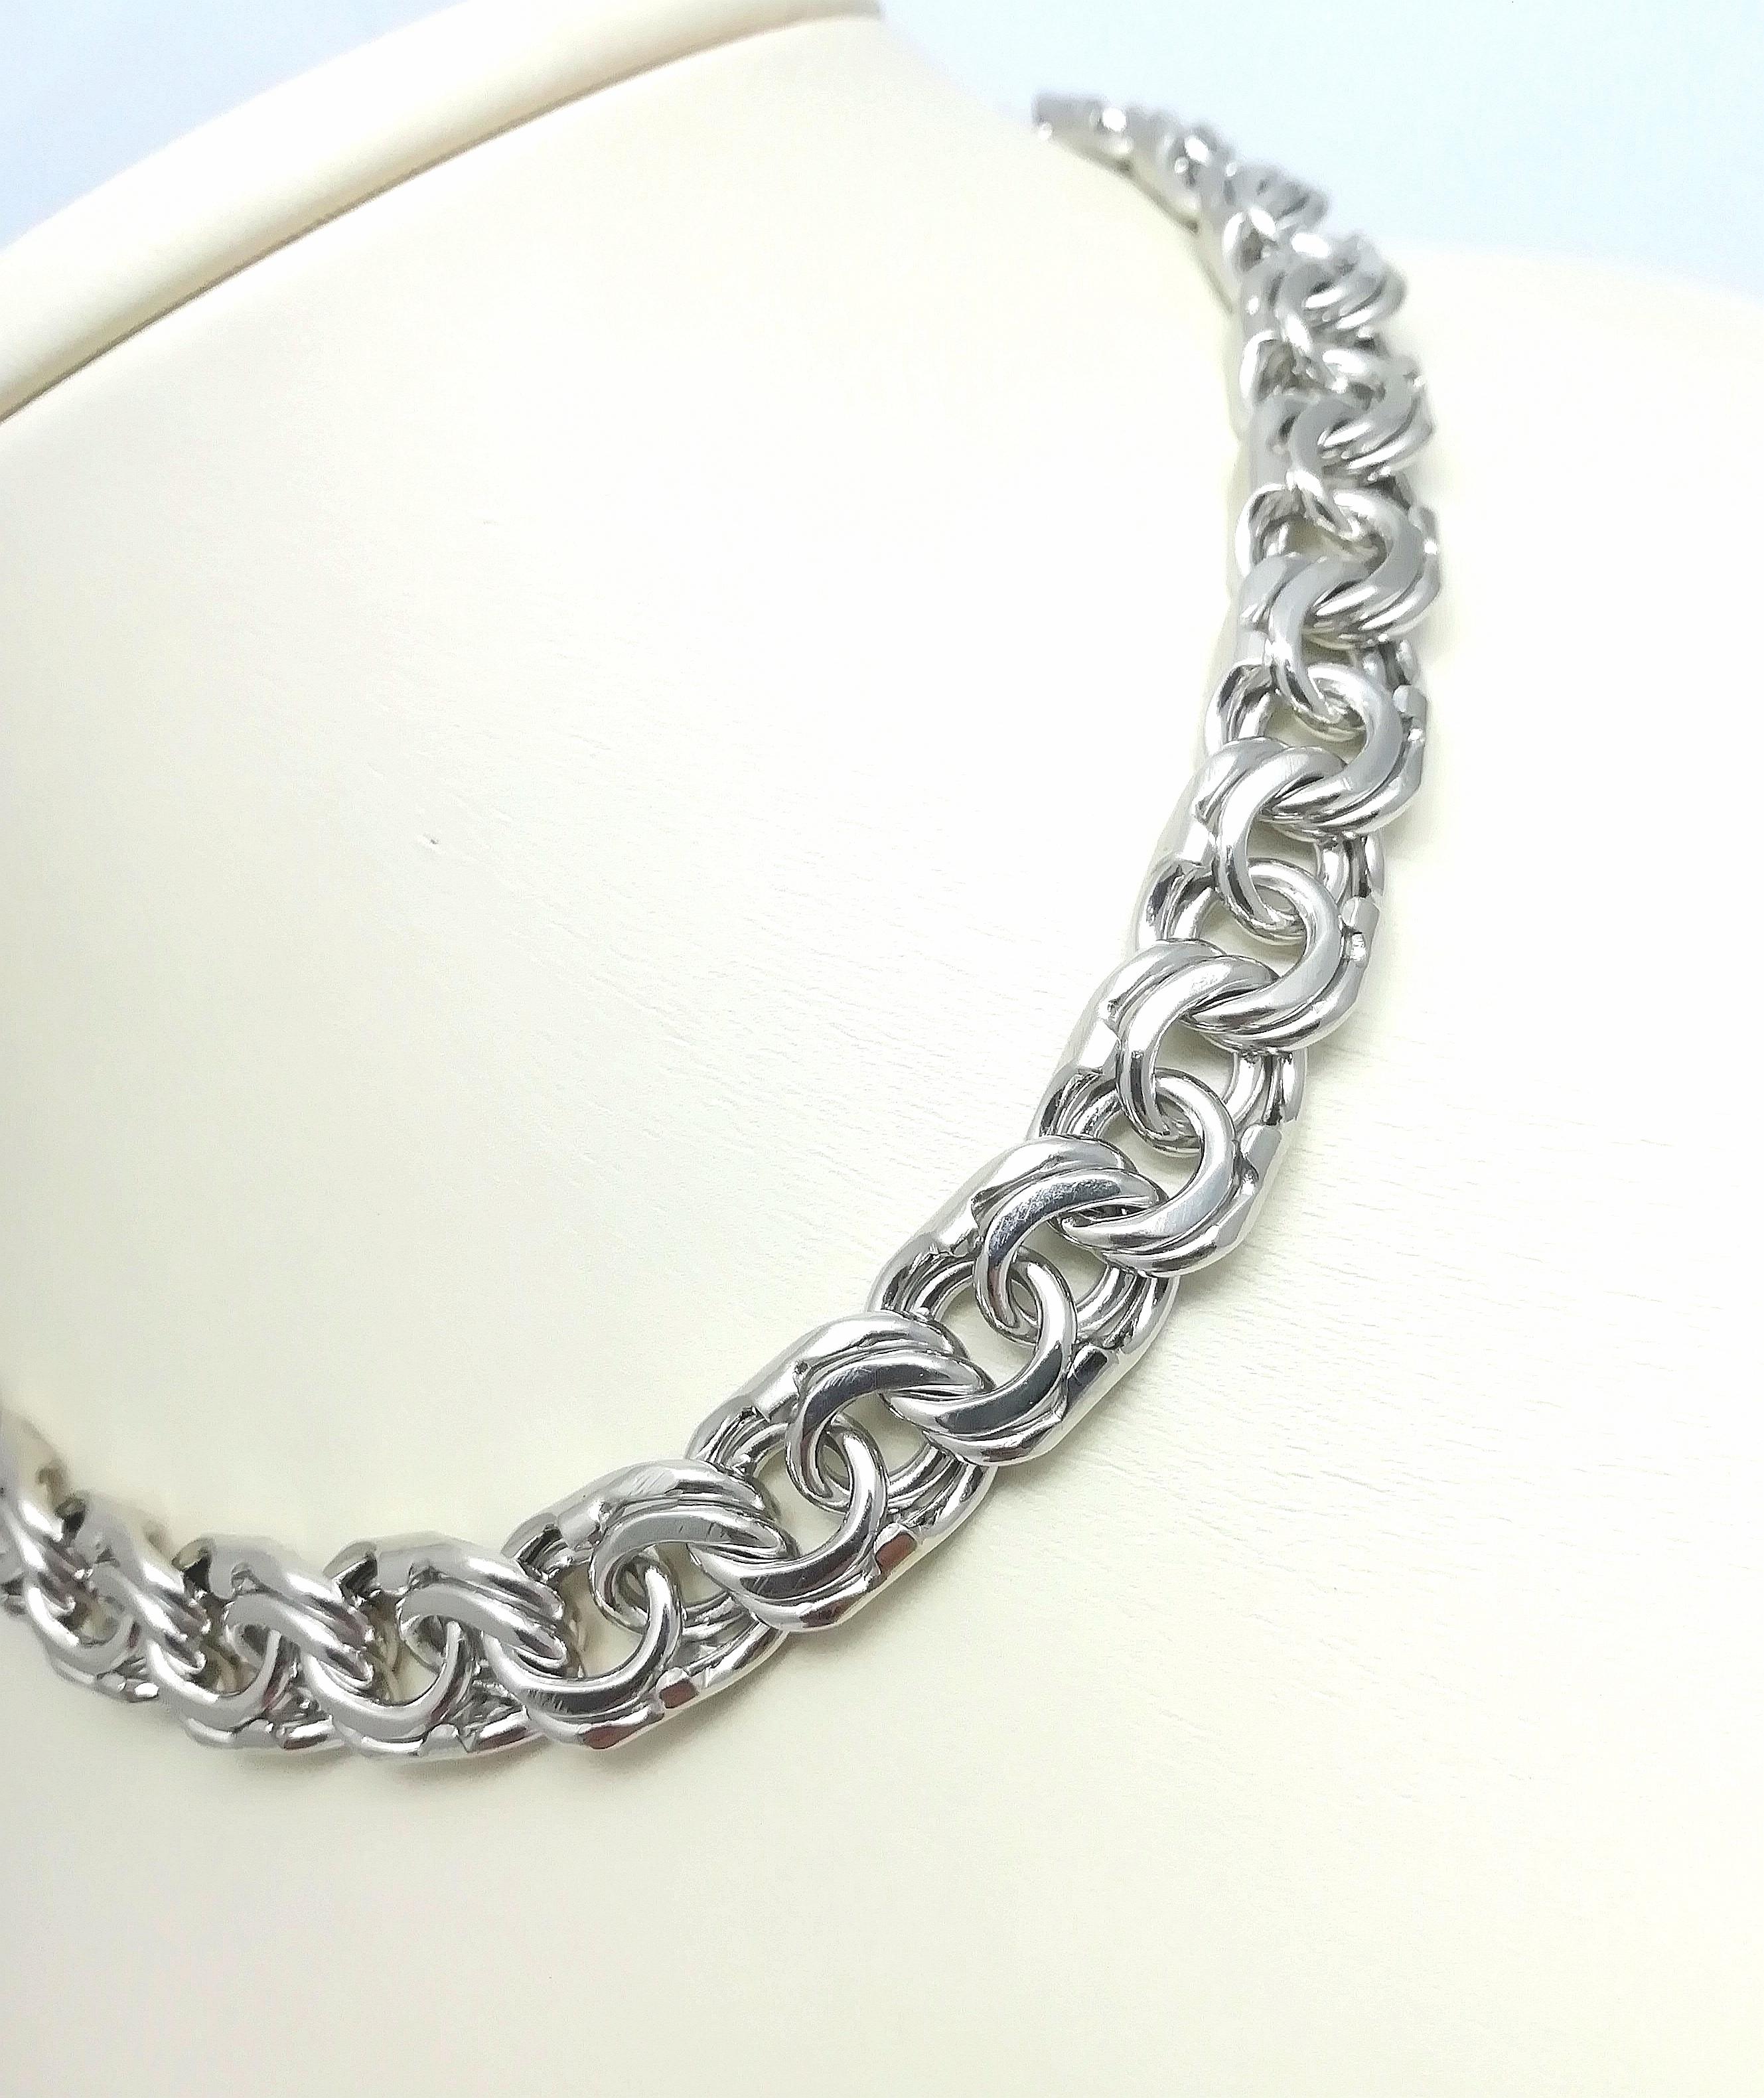 Серебро цепь дк240920-172 114,70гр